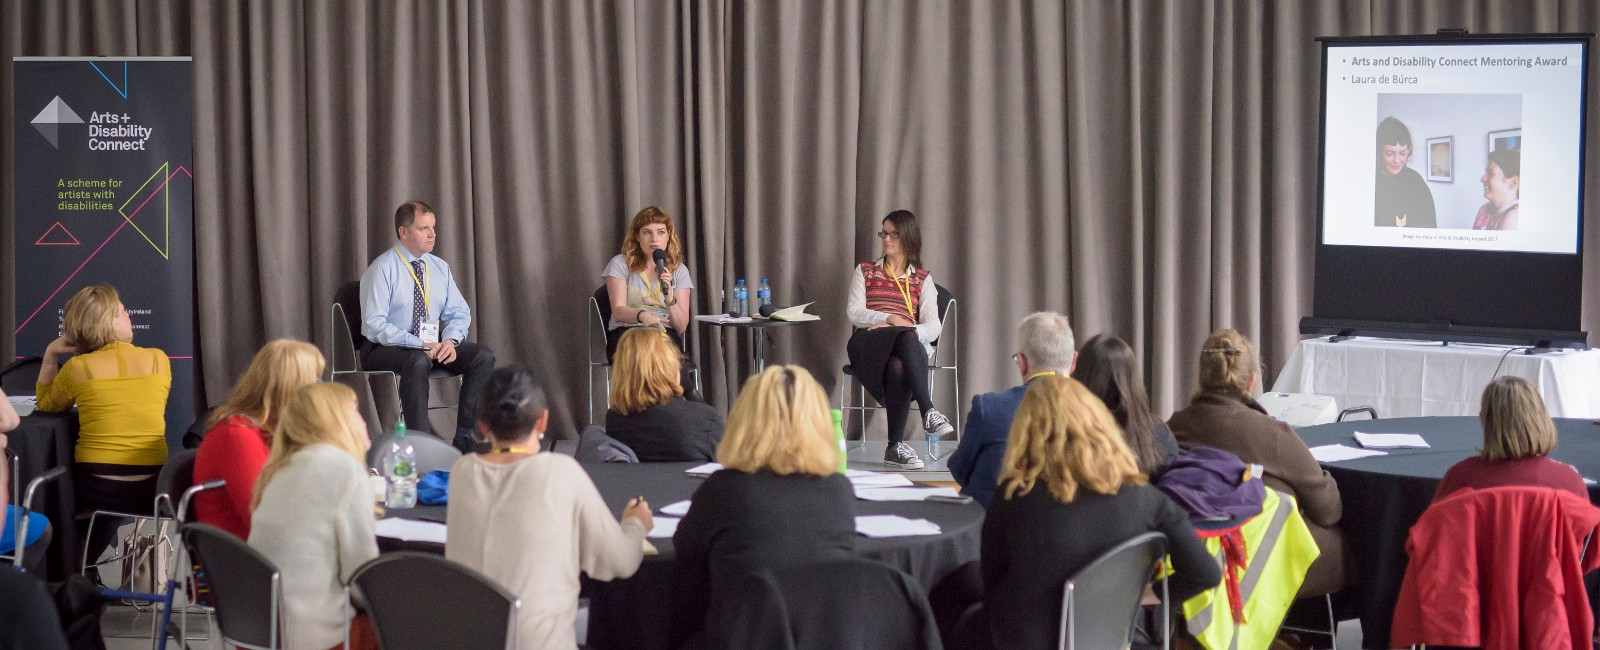 Pádraig Naughton, Maeve Mulrennan and Kath Gorman speak at an ADI event in Dublin.